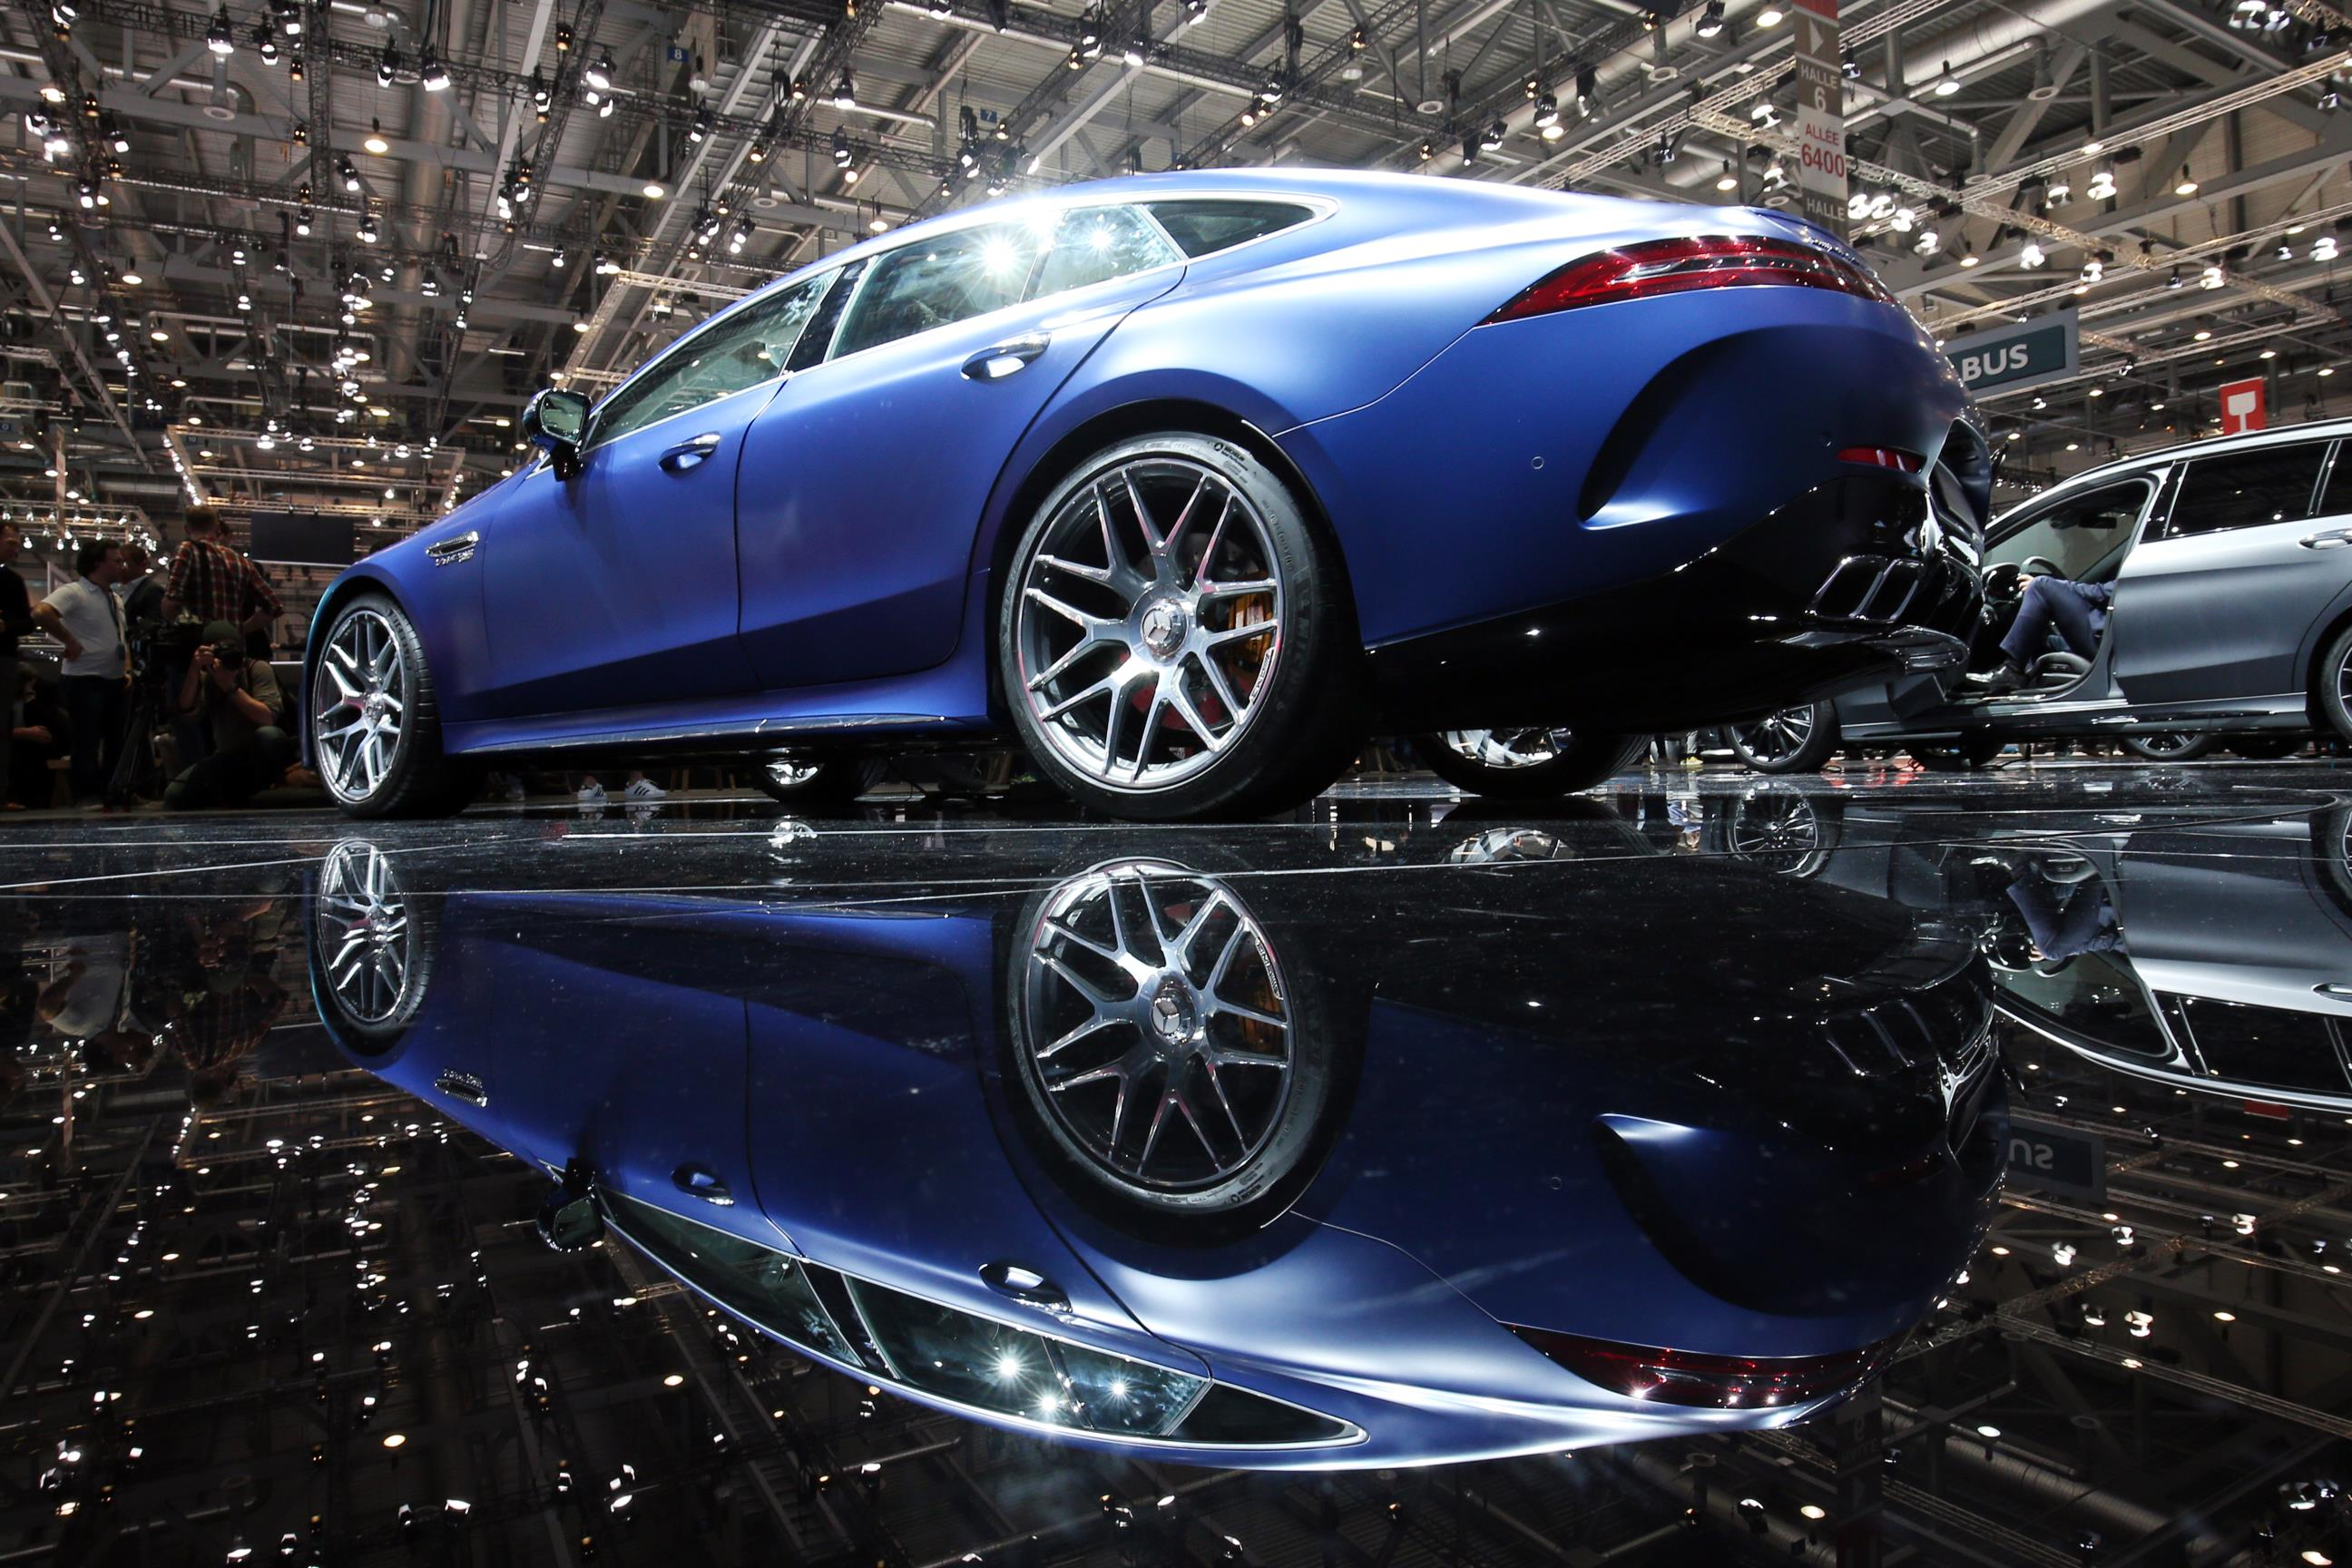 Geneva Motor Show 2018 Mega Gallery Part 2 (115)